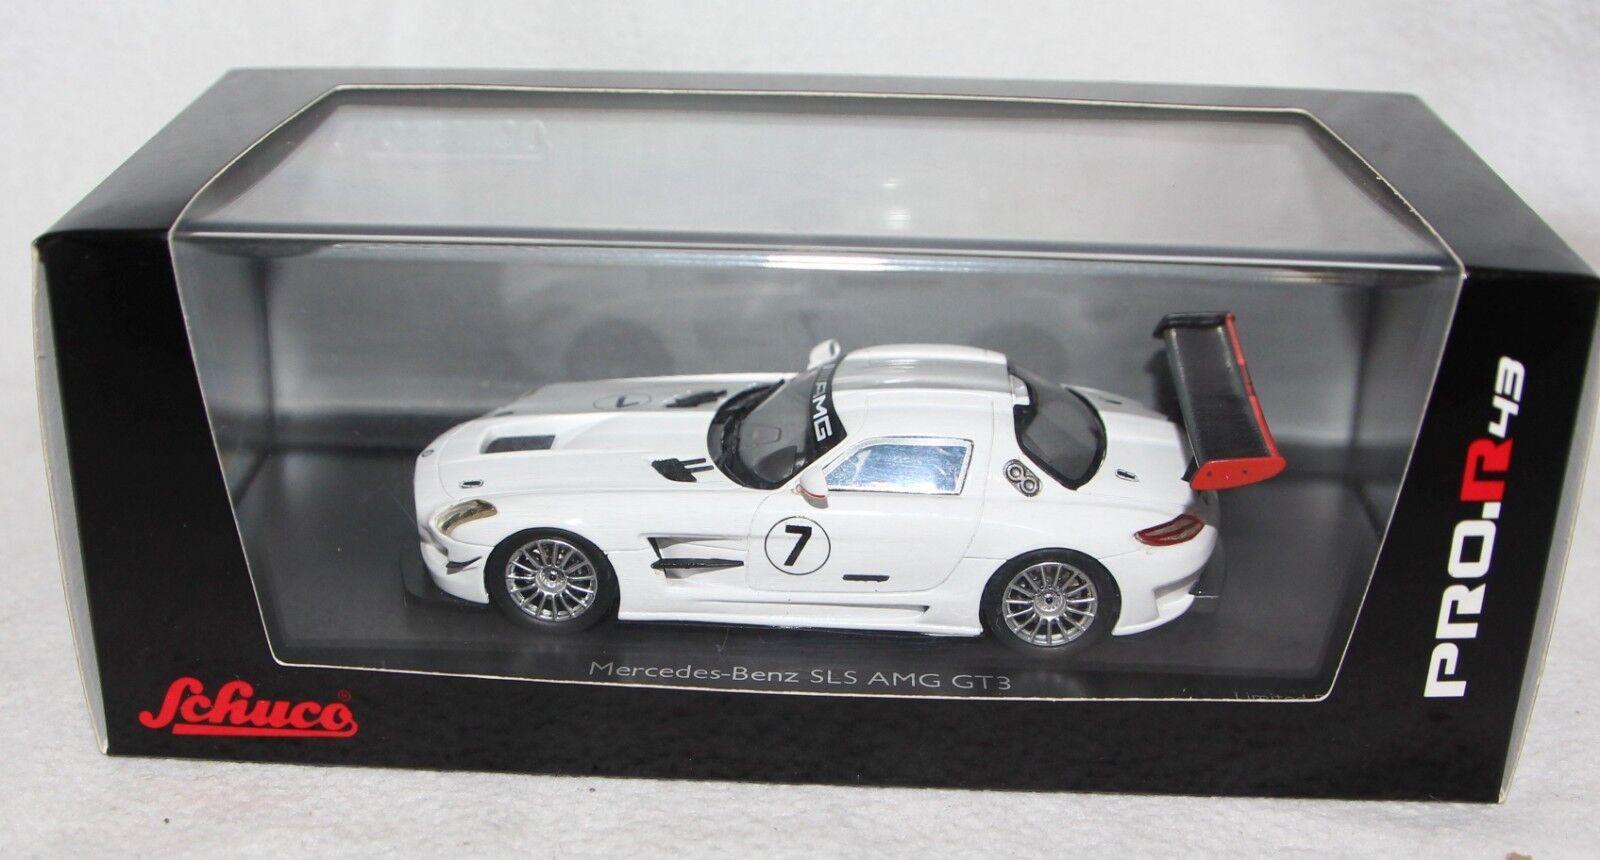 Schuco 1 43 pror 43 - 450881500-Mercedes Benz Sls amg gt3   7-NEUF dans neuf dans sa boîte